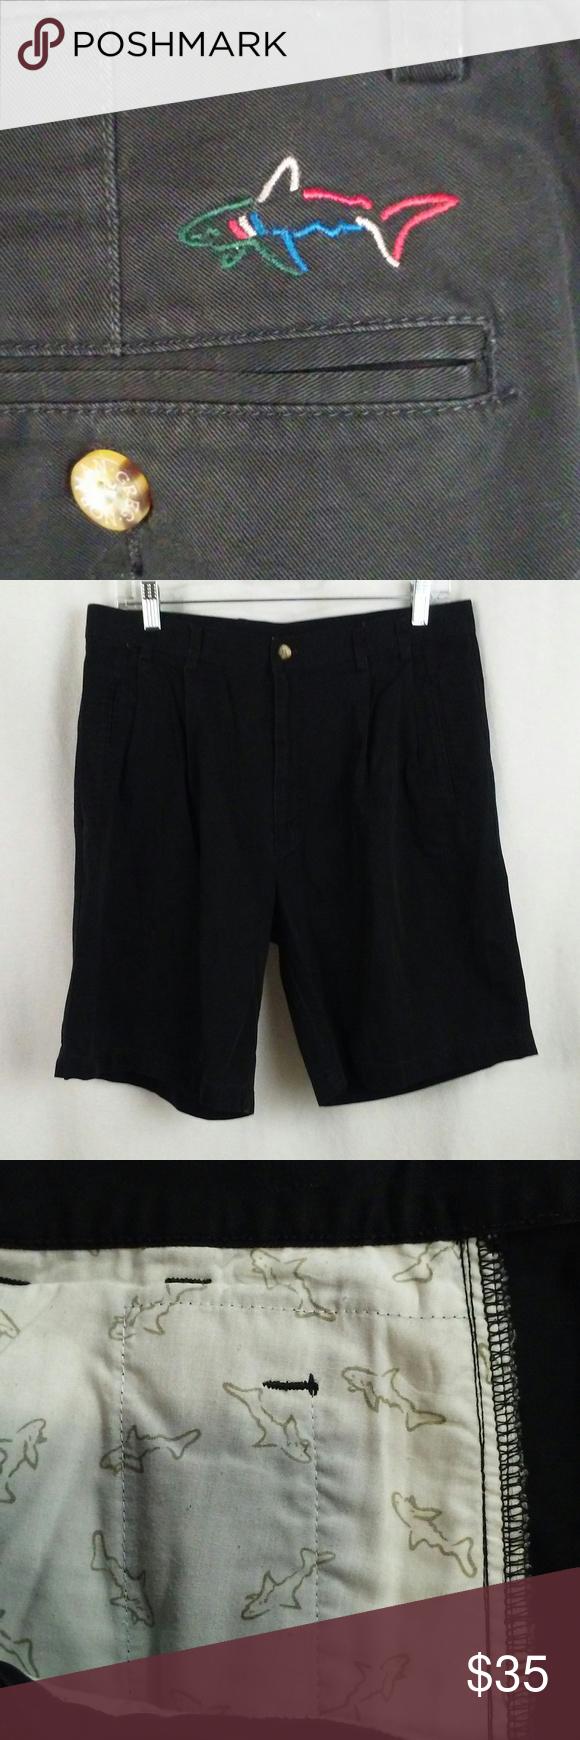 Greg Norman Shorts 34x9 Black Pleats Shark Logo Clothes Design Pleats Fashion Design